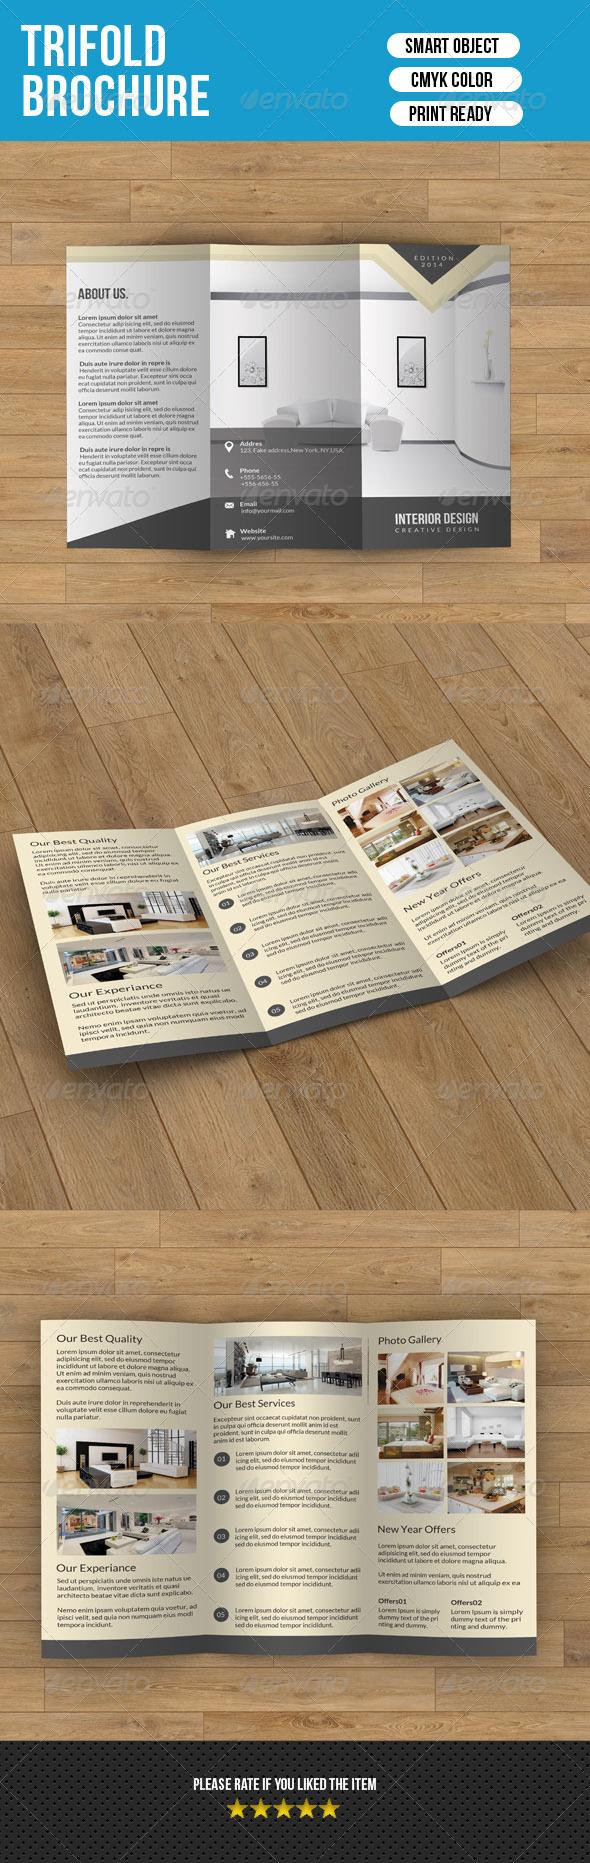 GraphicRiver Minimal Trifold-Interior Design V2 7000737